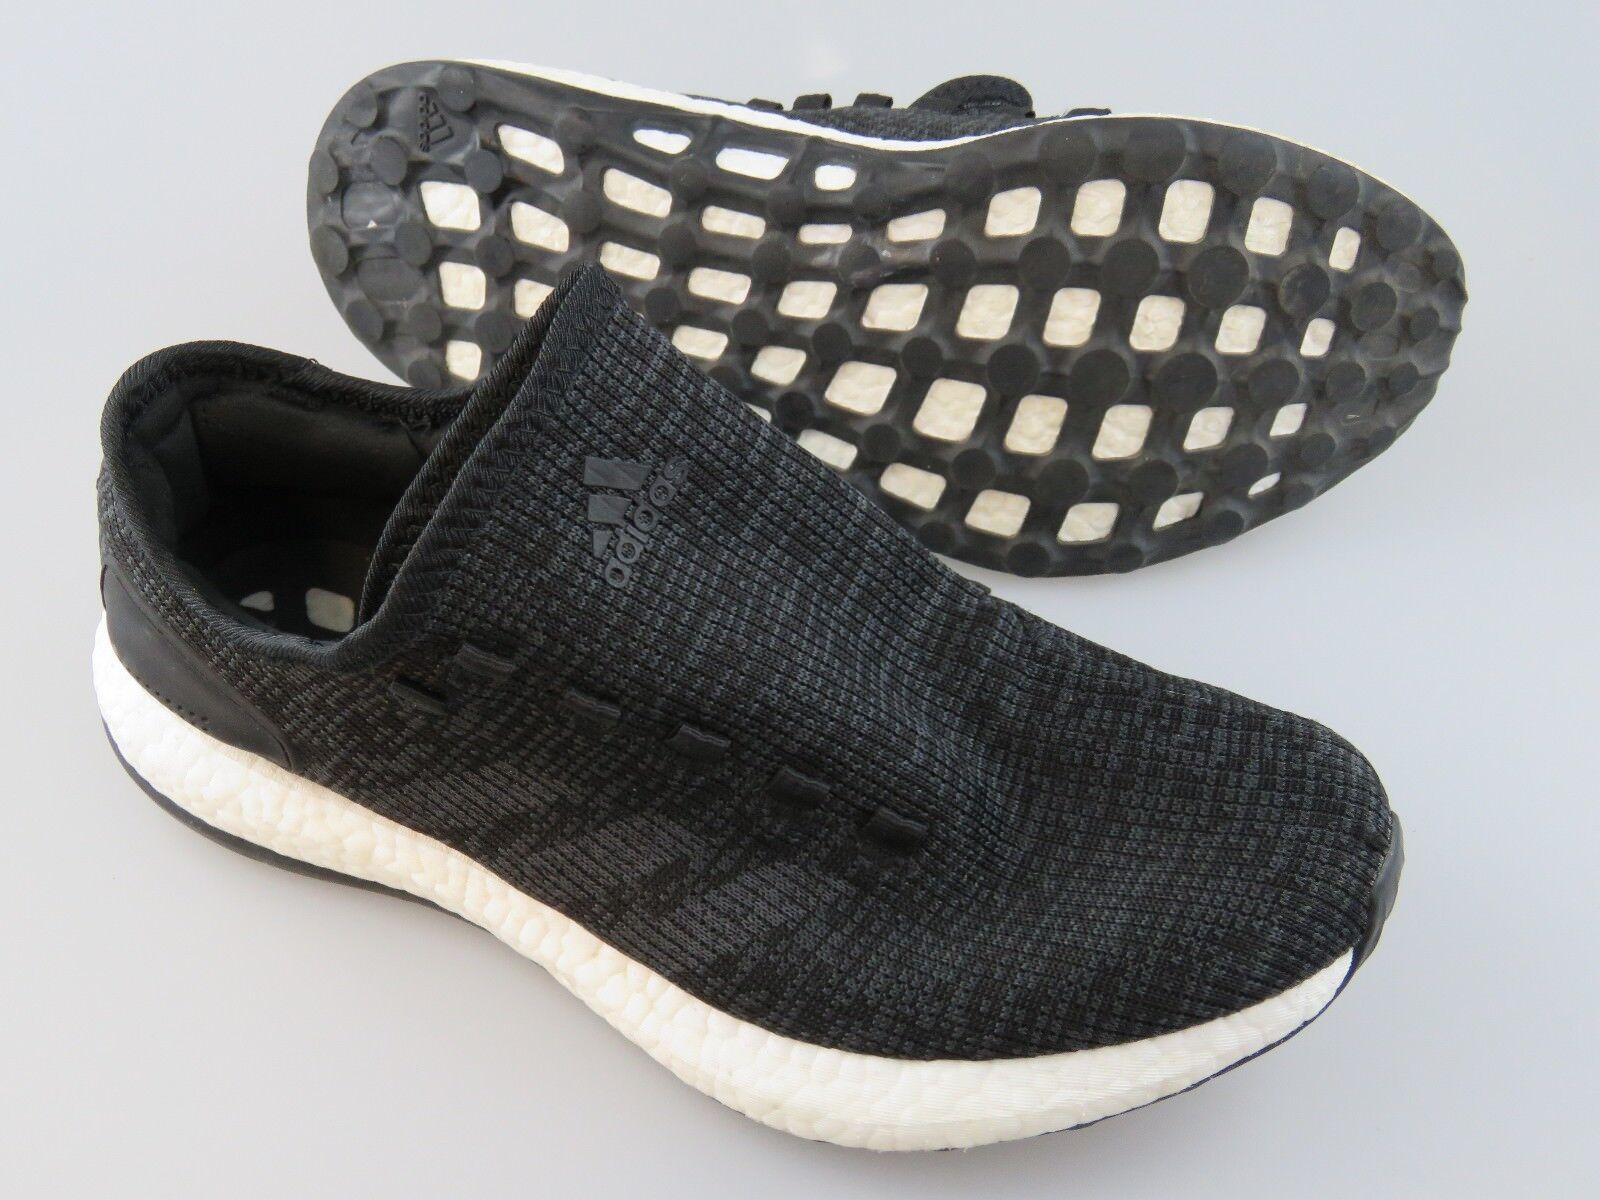 Adidas PureBoost Black White Men Size 10.5 BA8899